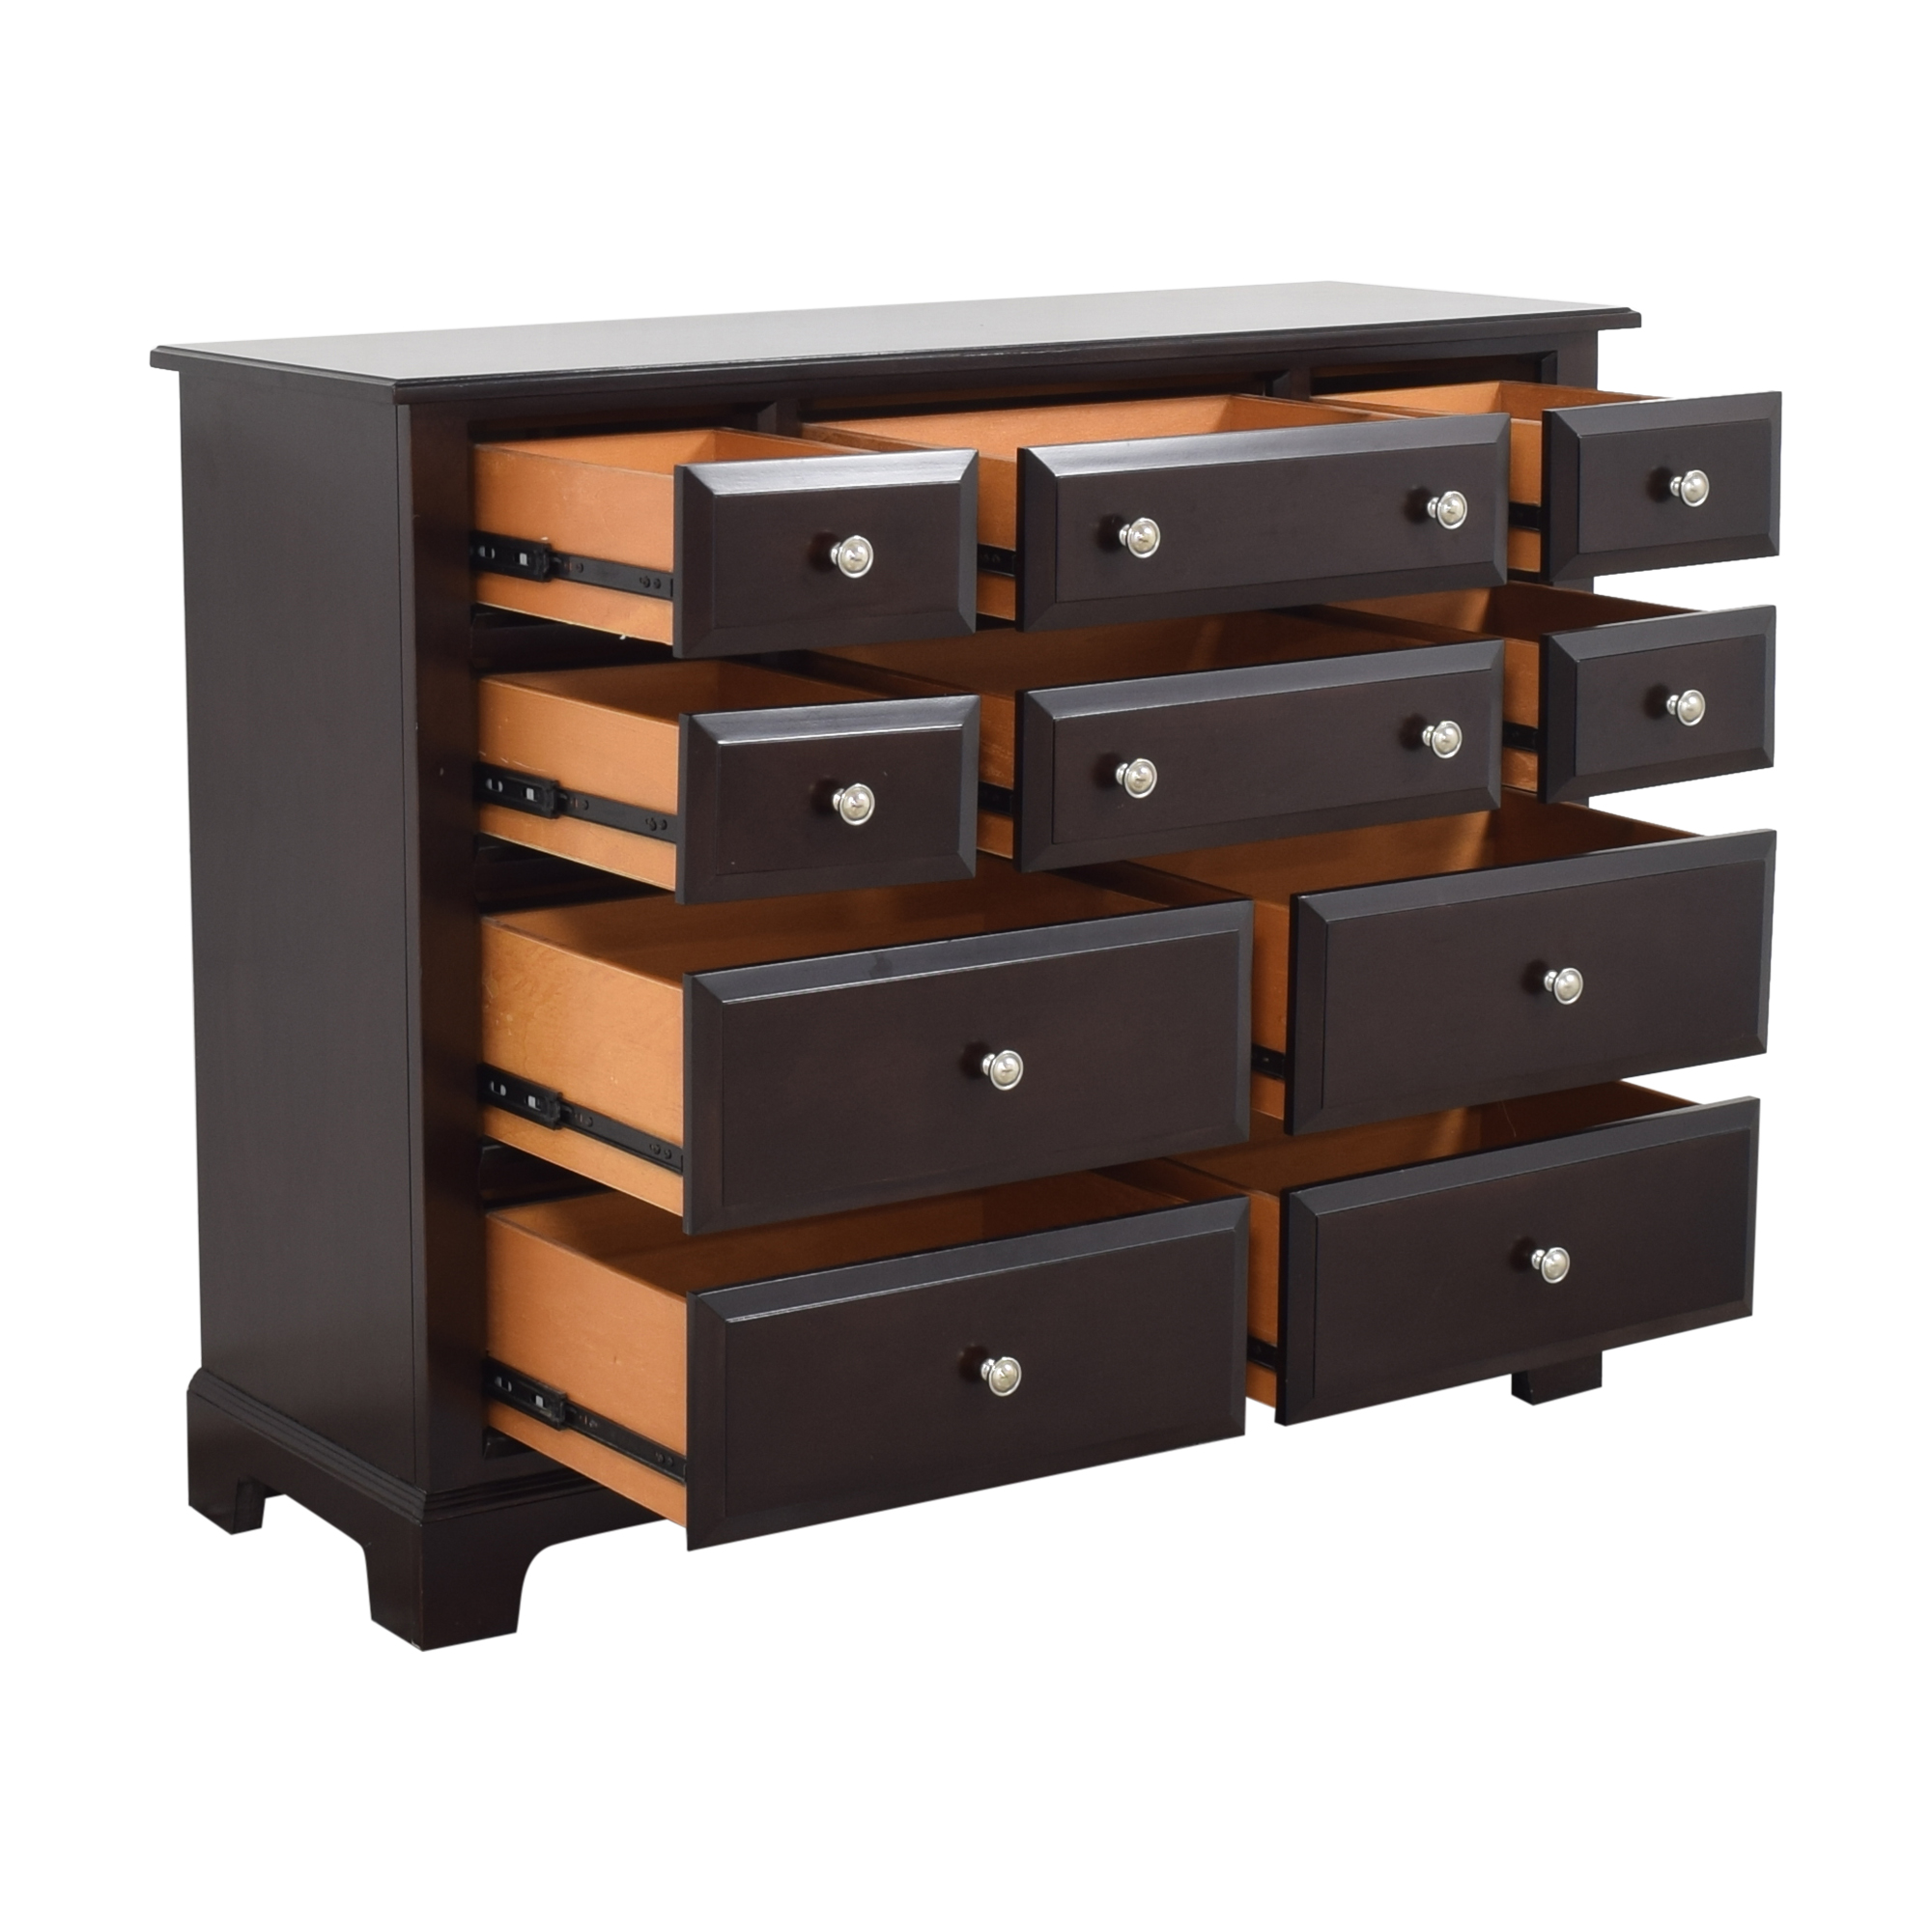 Raymour & Flanigan Raymour & Flanigan Horizon Ten Drawer Dresser Storage